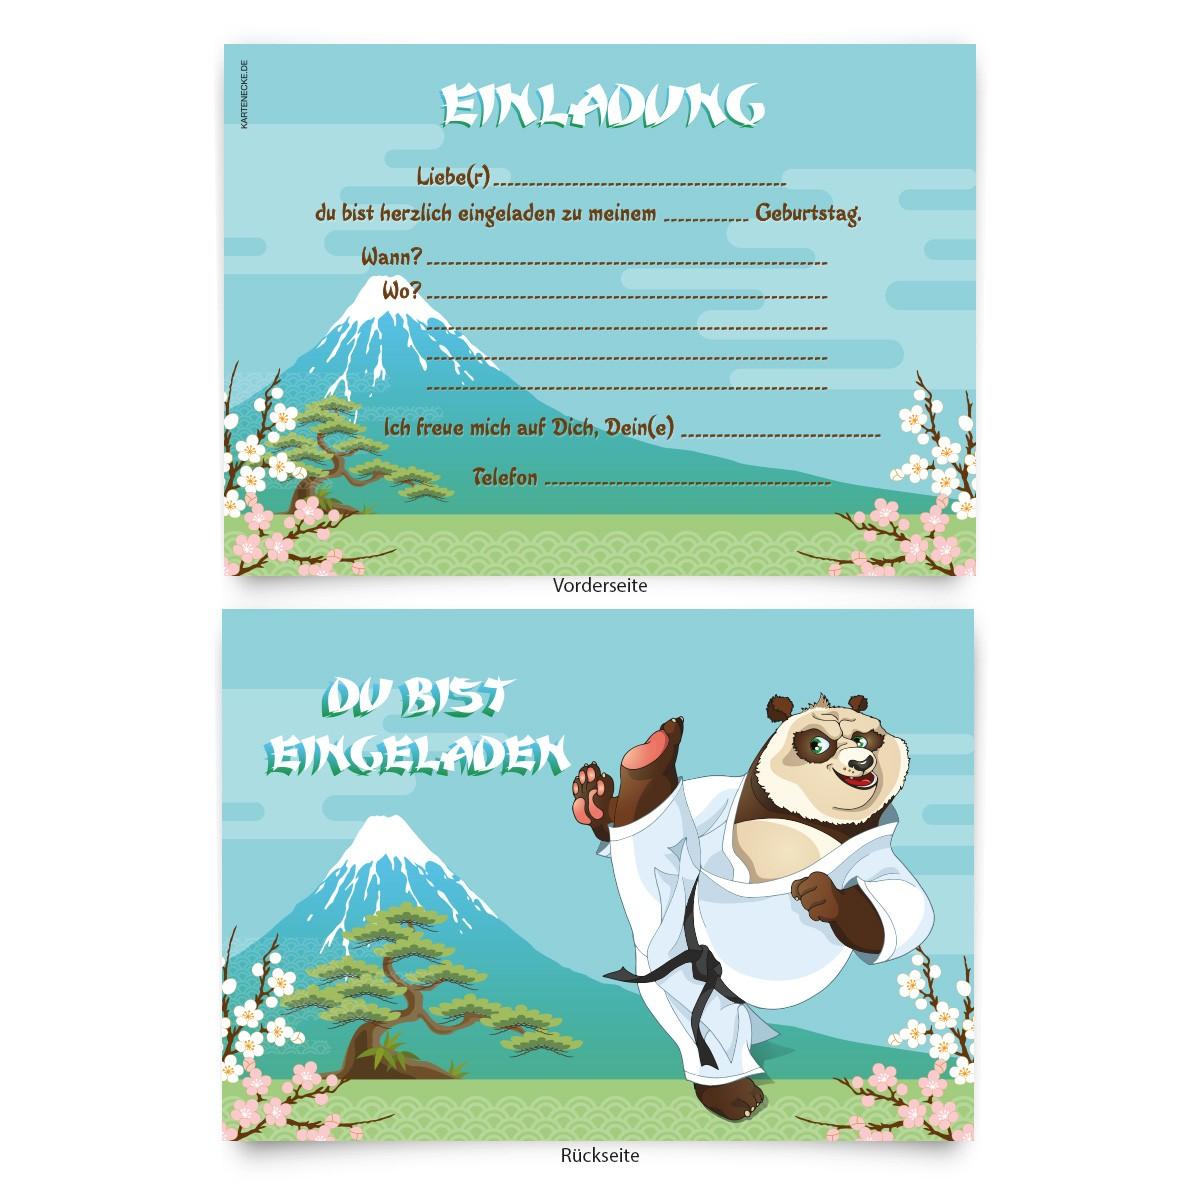 Related Image For Einladung Kindergeburtstag Text 2. Geburtstag